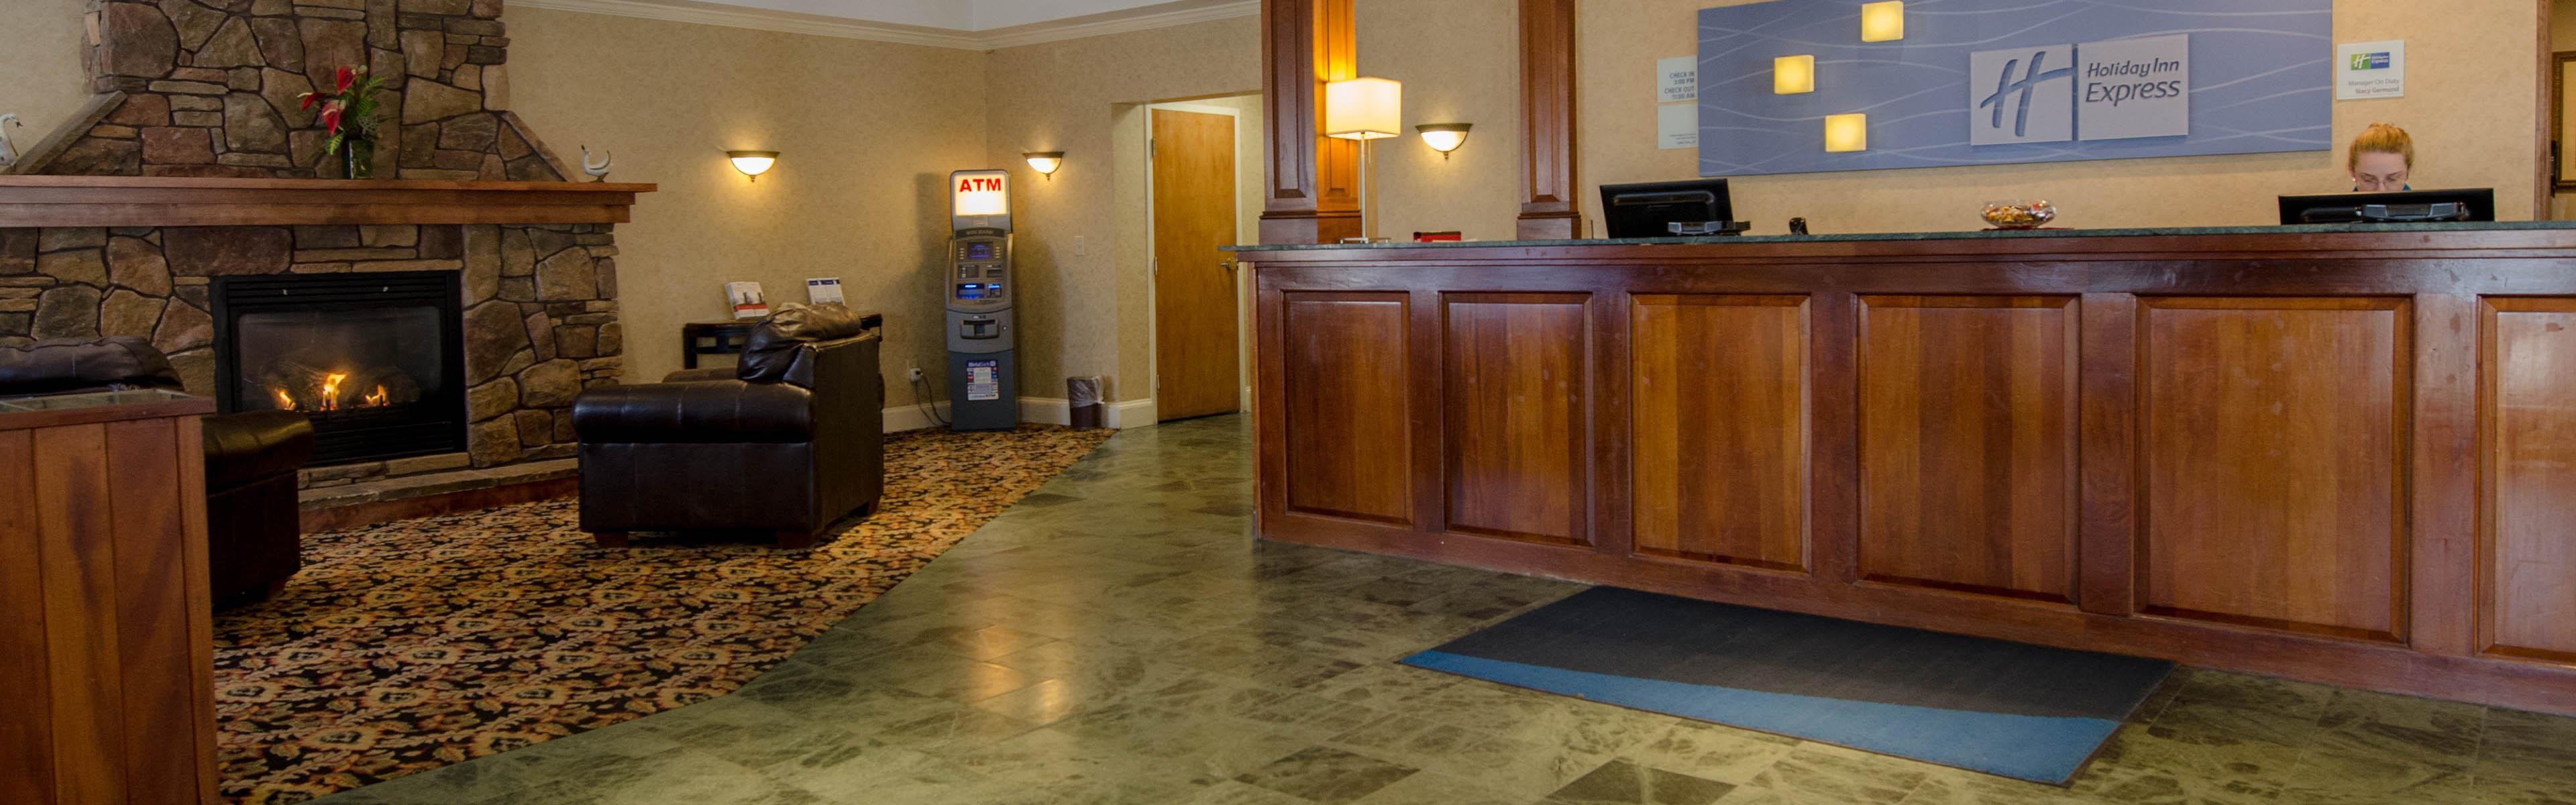 Holiday Inn Express South Burlington image 0